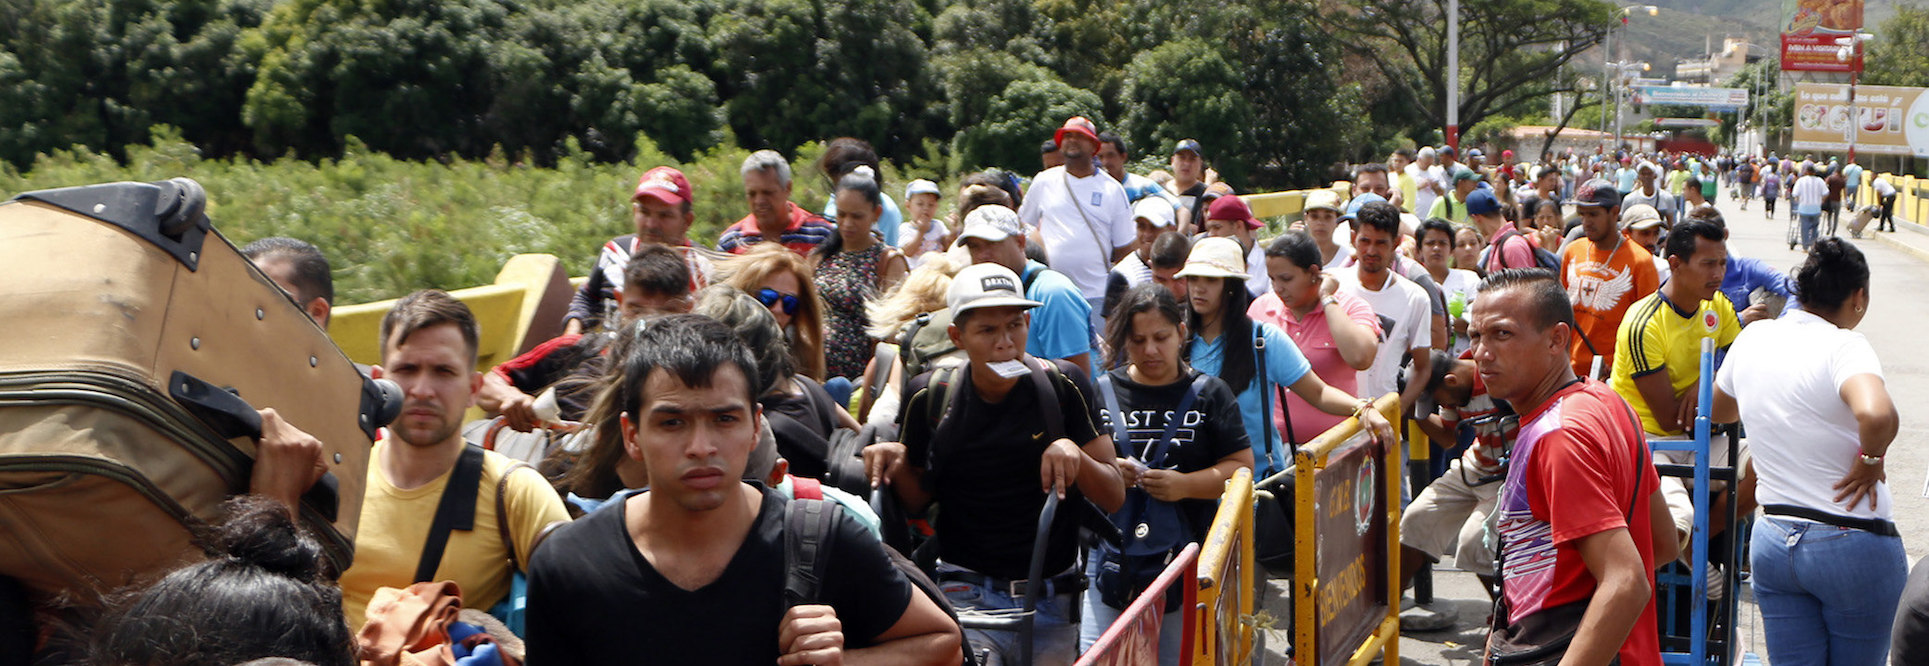 Venezuelans flee in droves